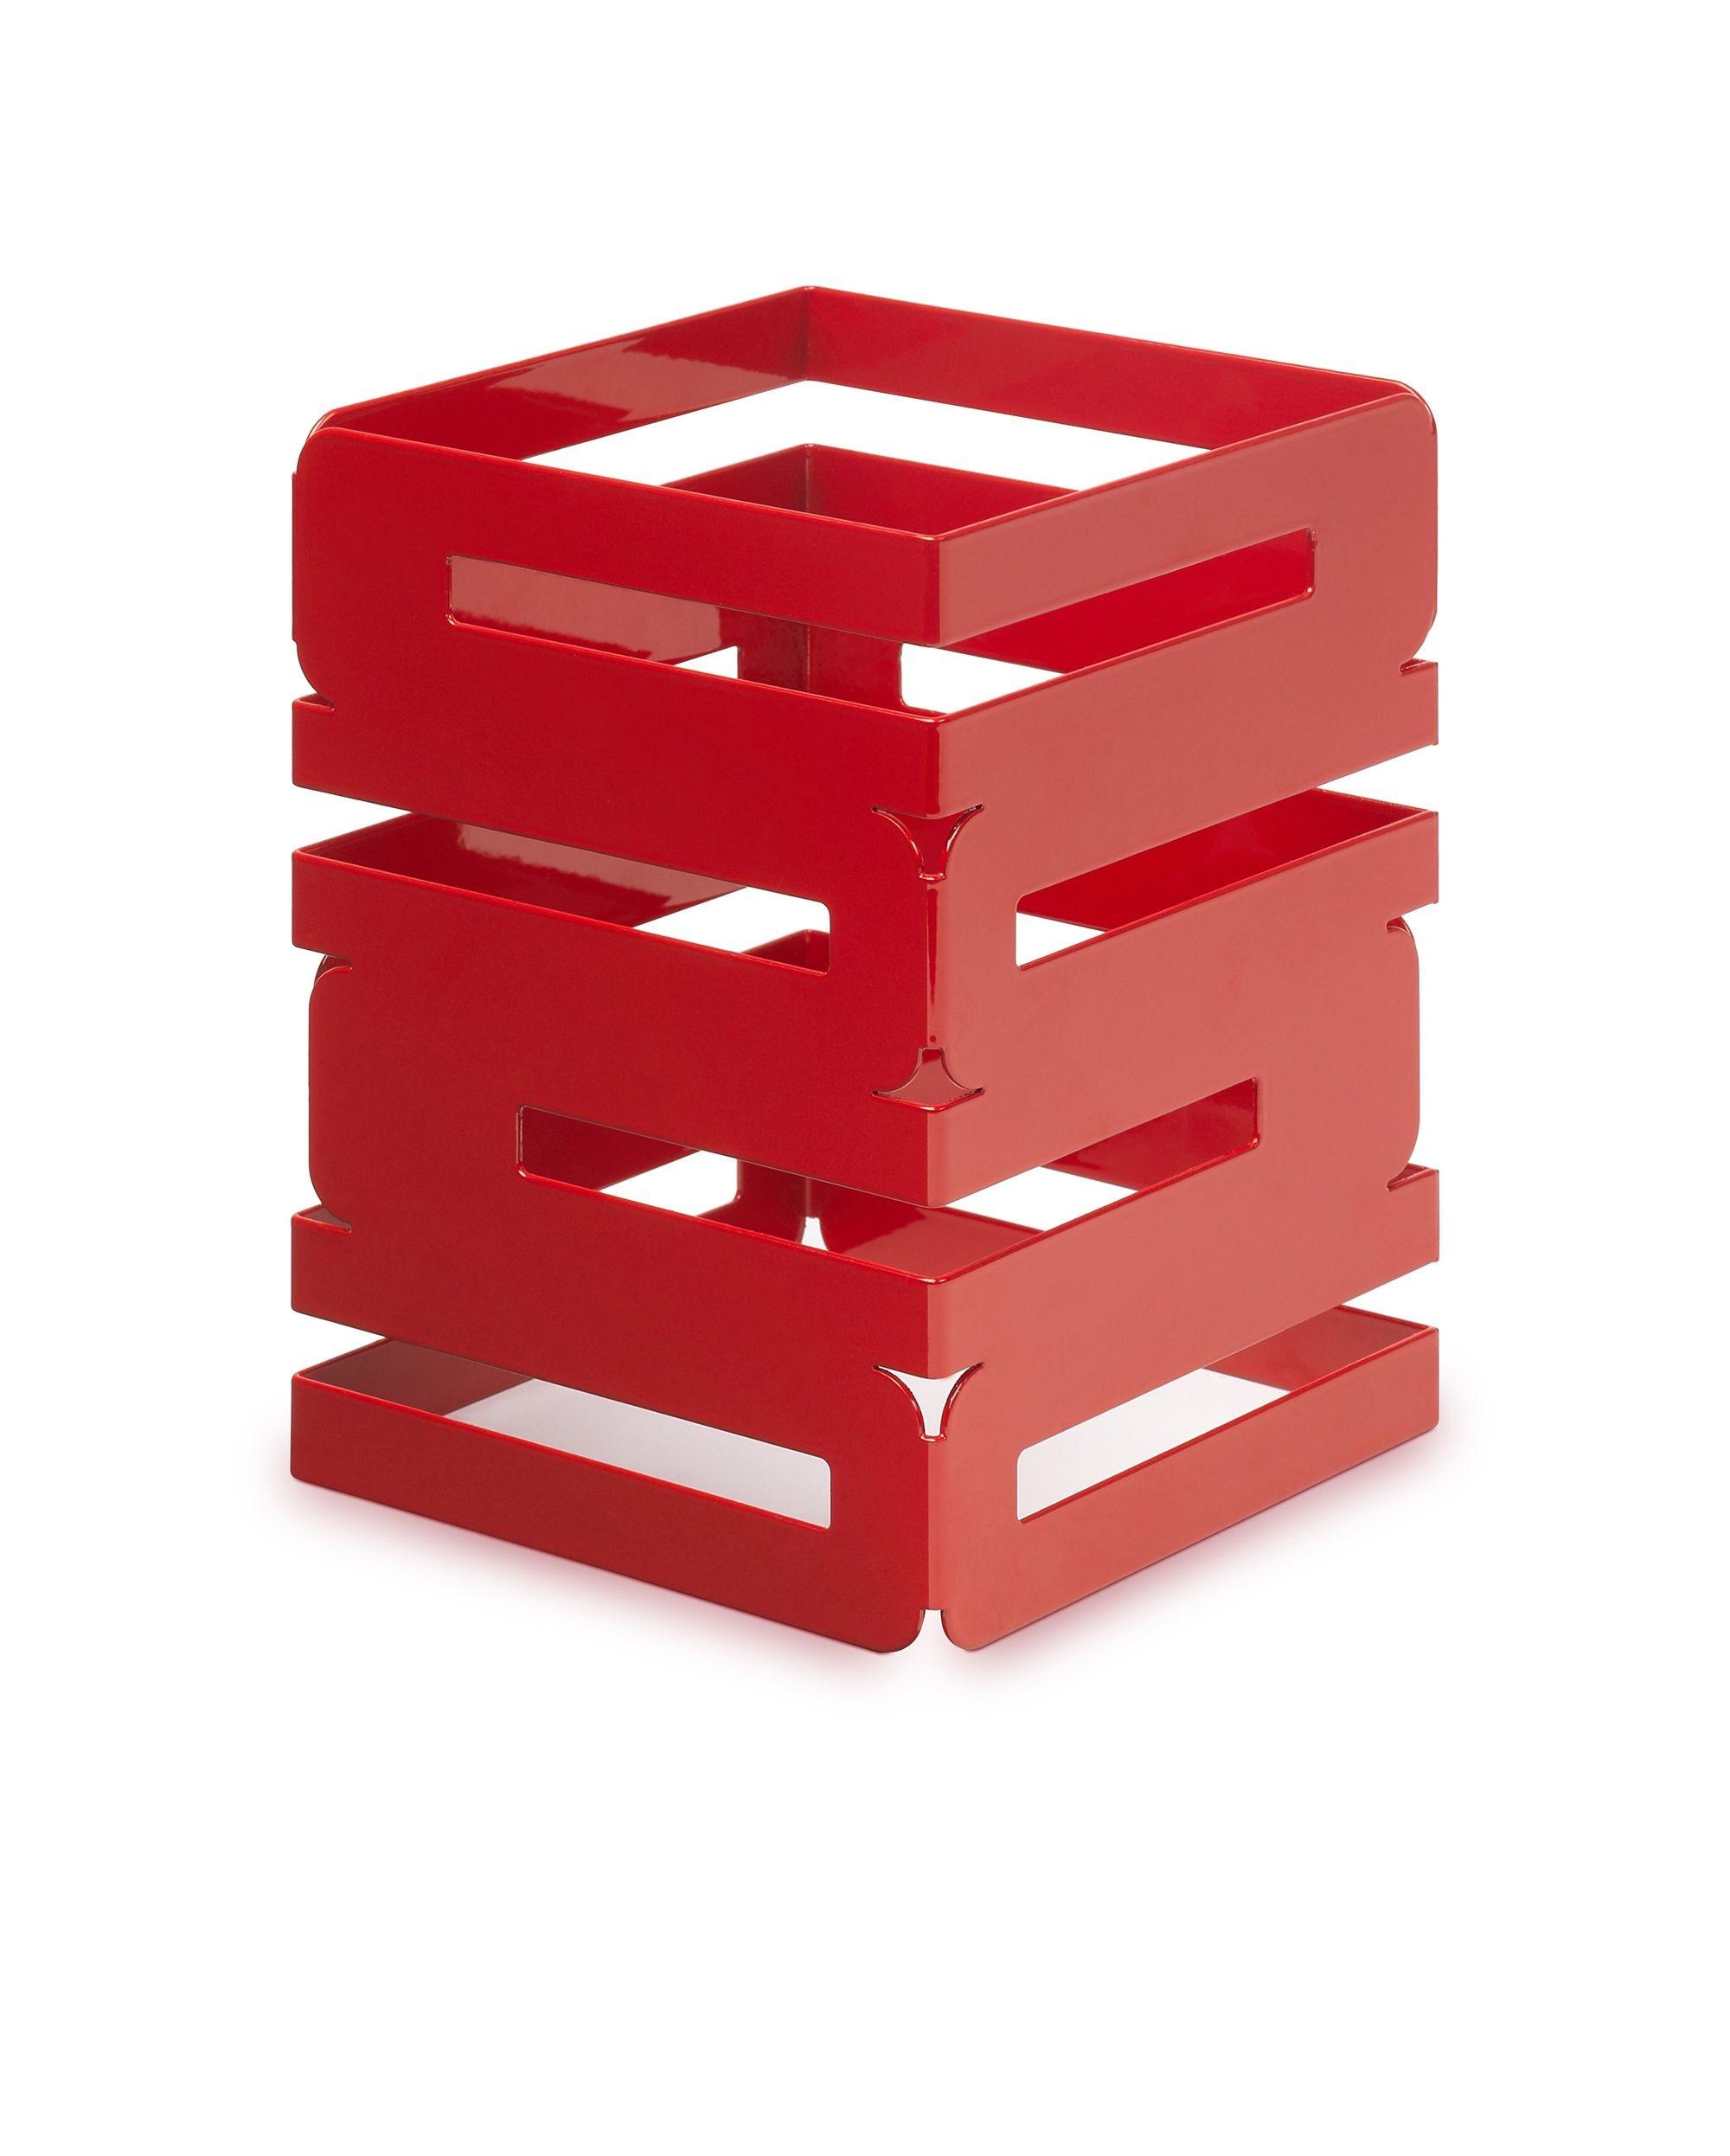 "Rosseto SM185 Skycap Red Gloss Steel Square Multi-Level Riser 6"" x 6"" x 8""H"